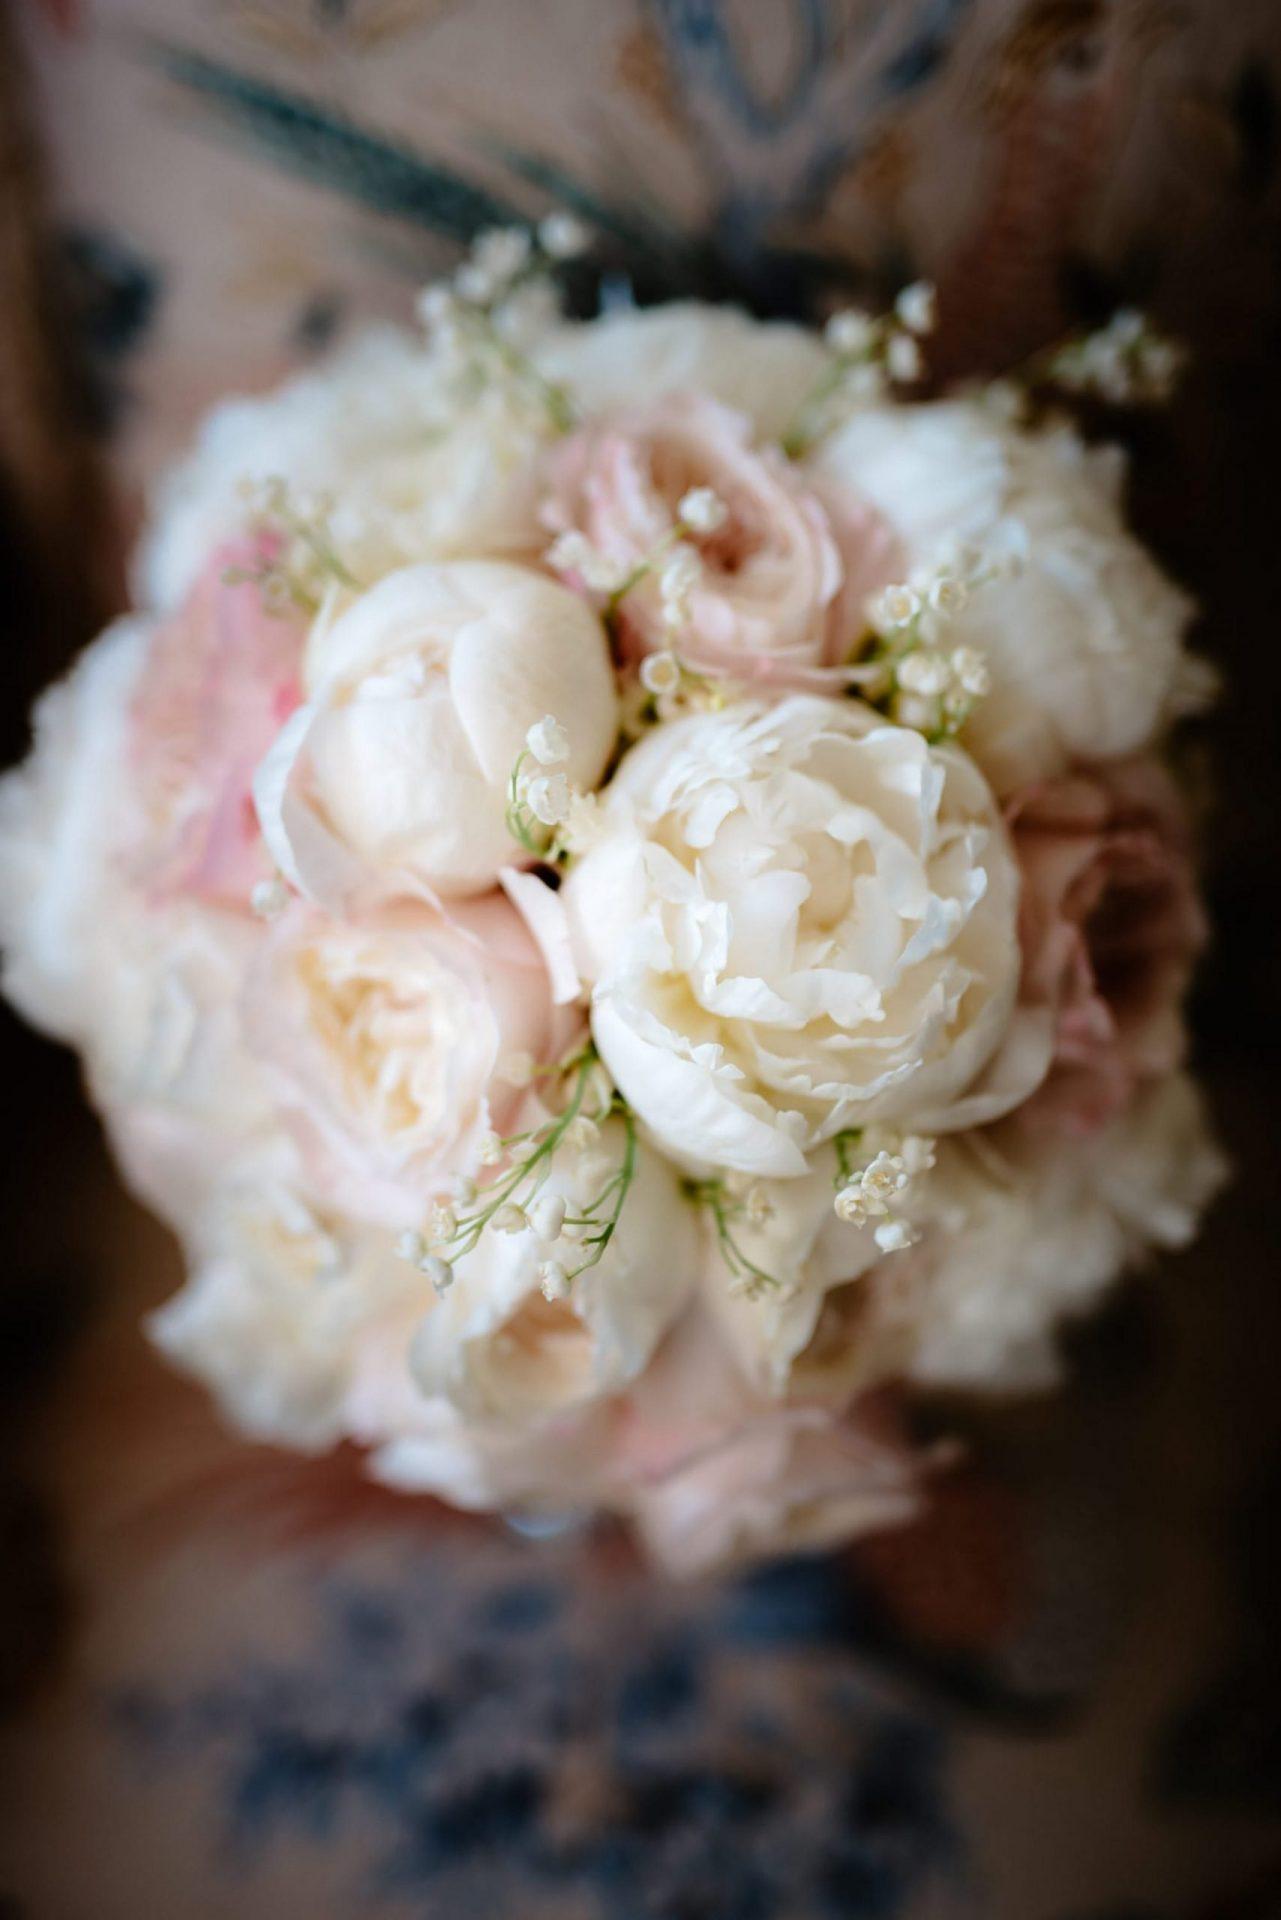 Francesca and Francesco, the bride bouquet